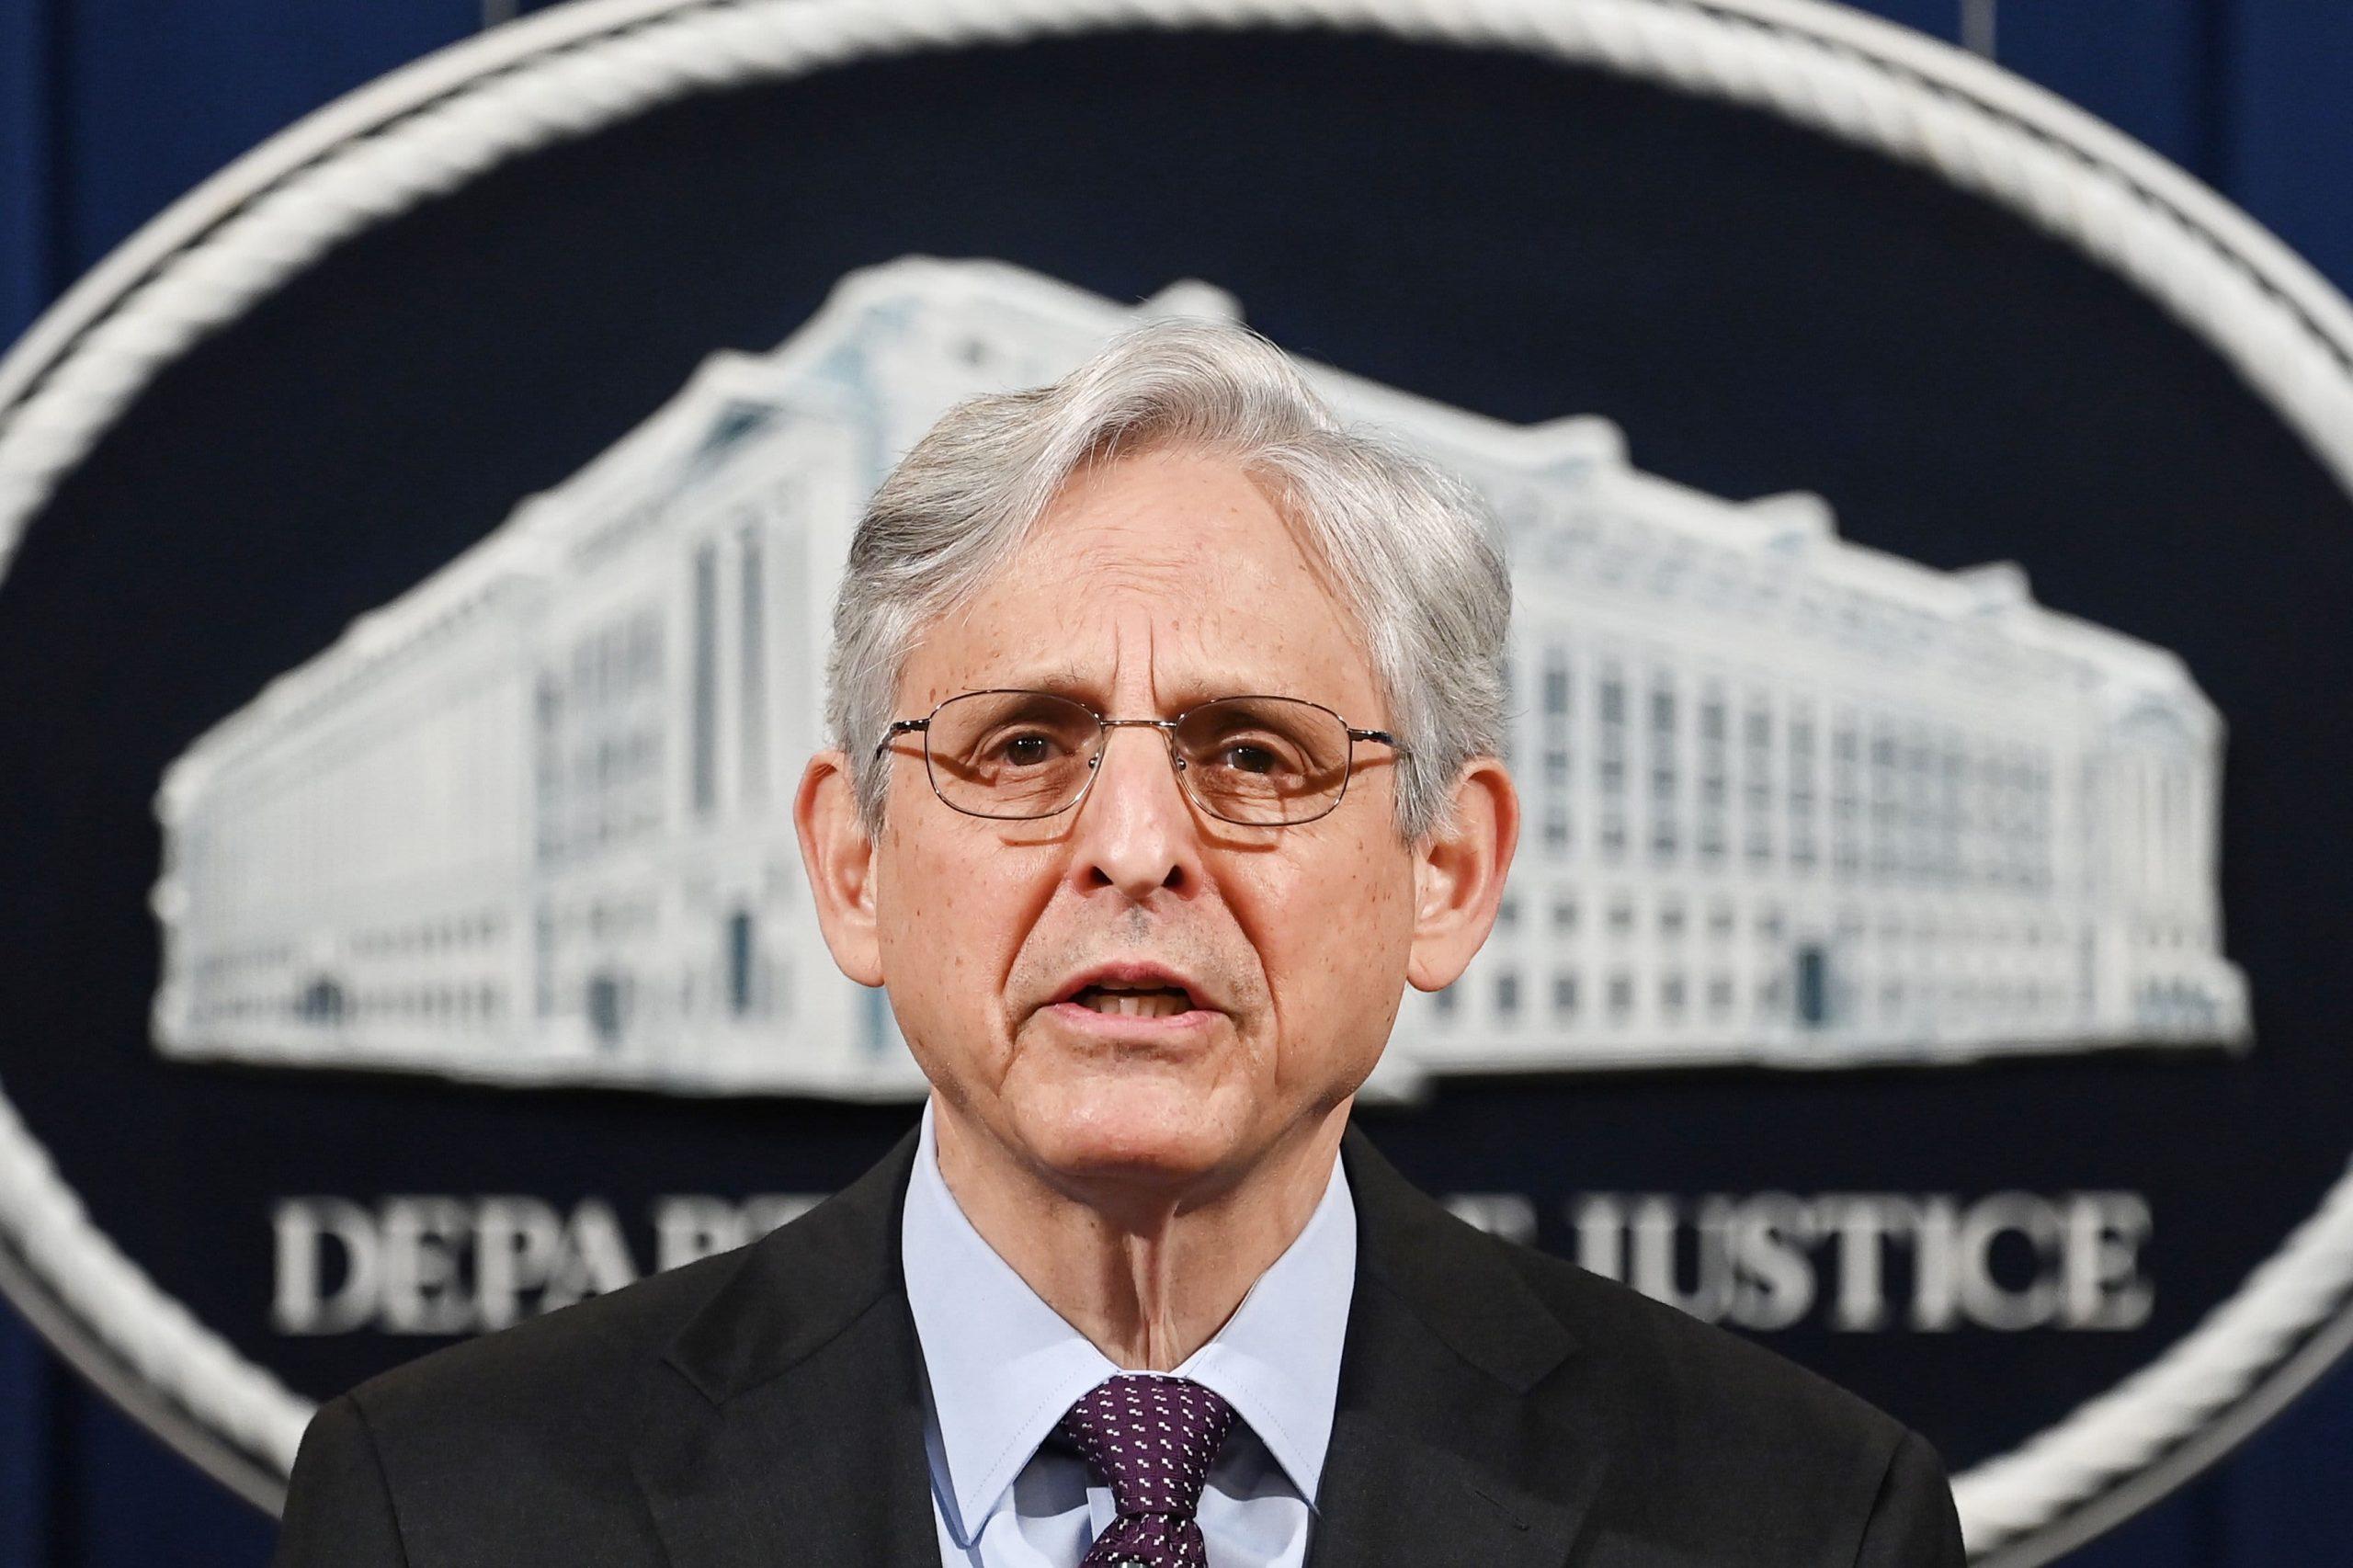 Supreme Court calls for Biden DOJ to weigh in on Harvard affirmative action case